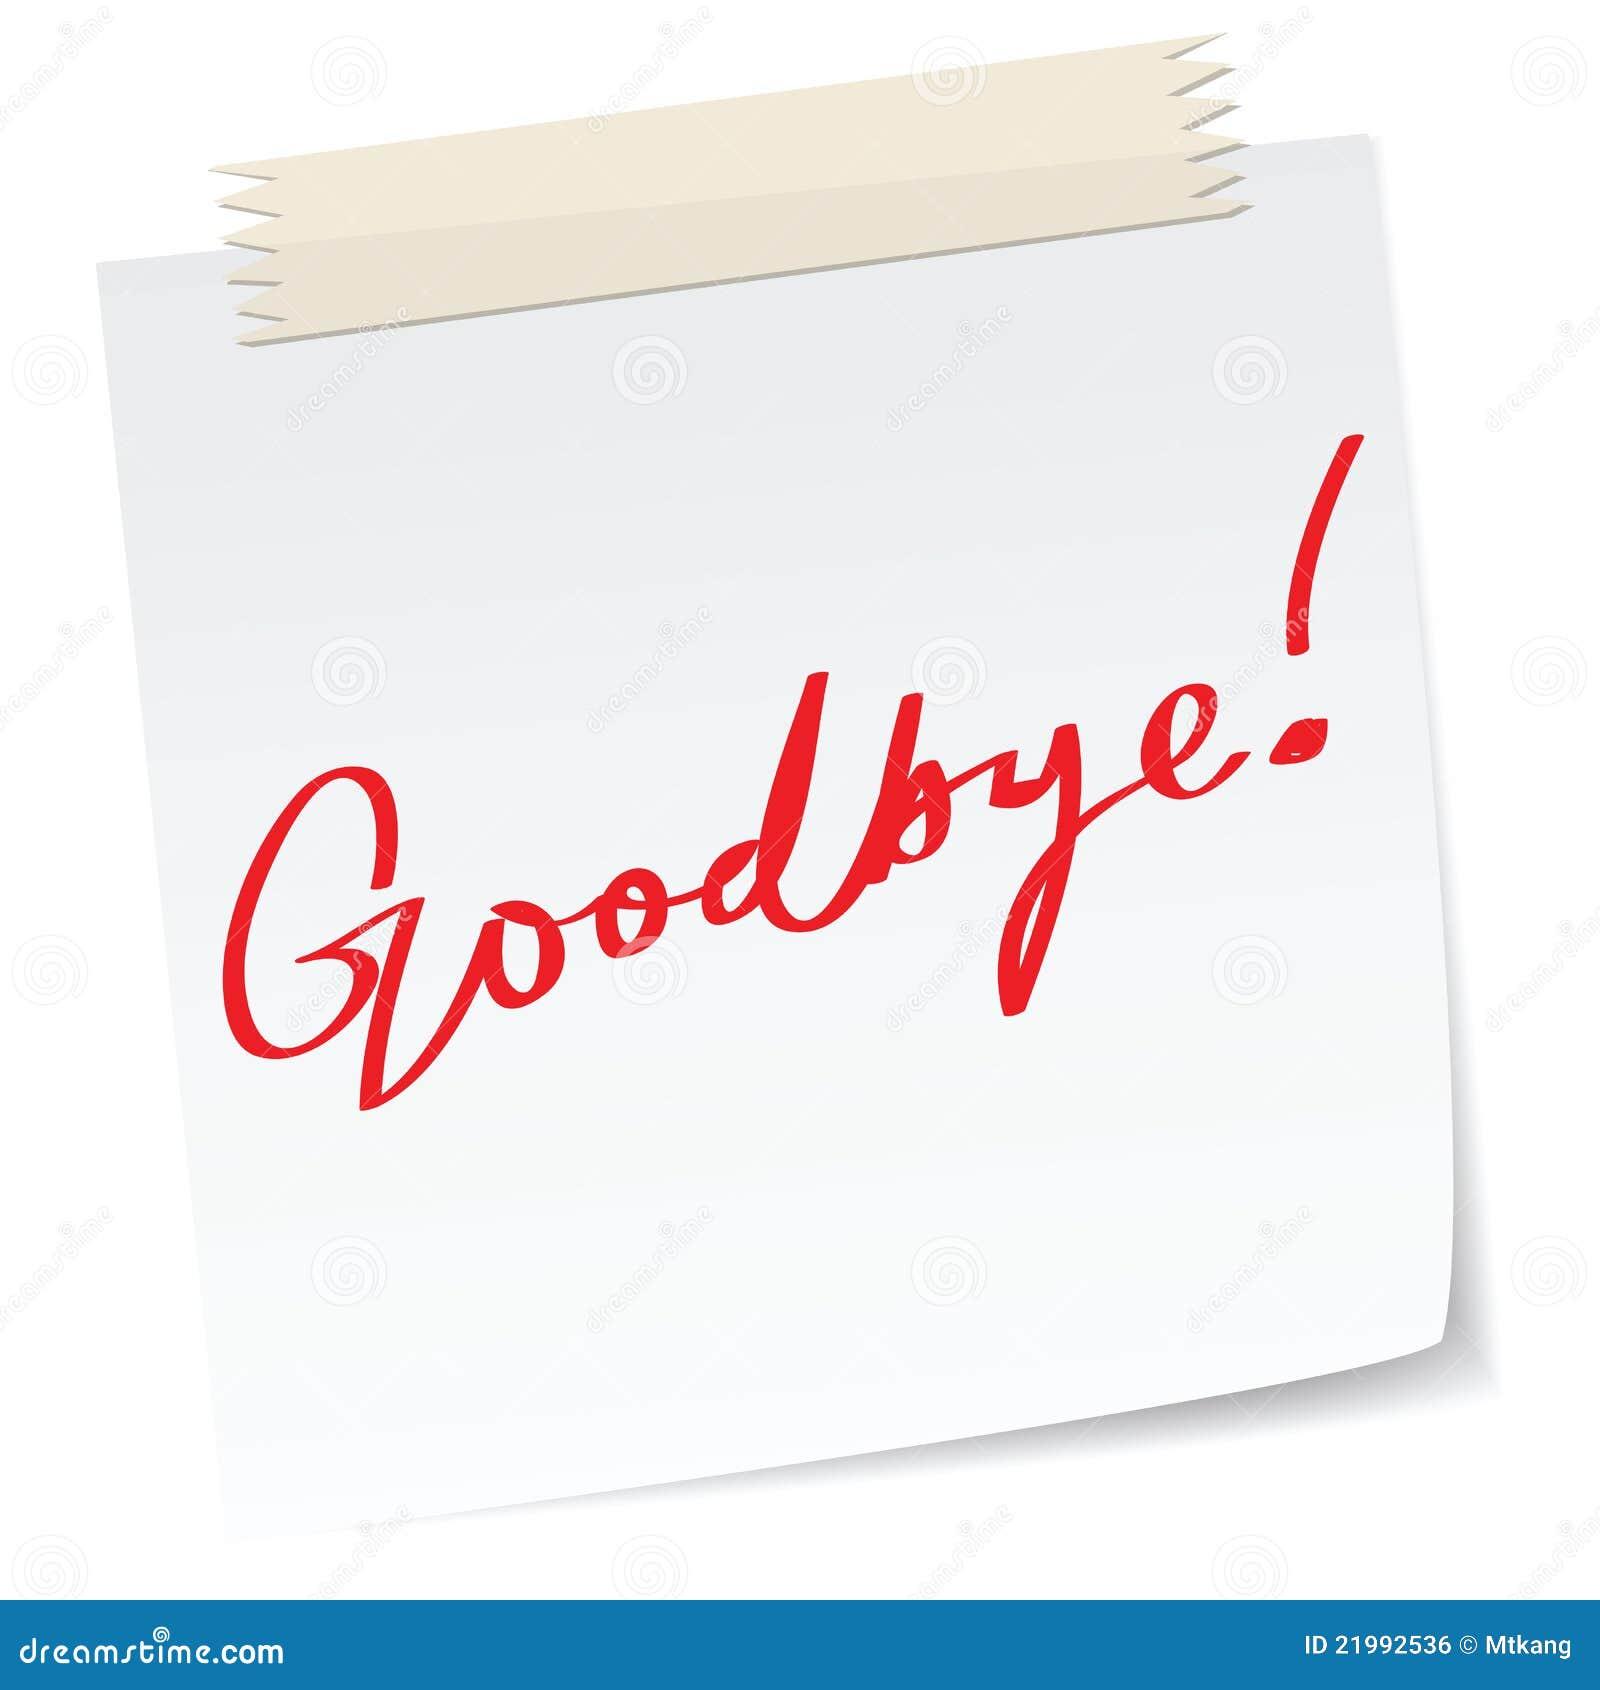 Business Letter Good Bye